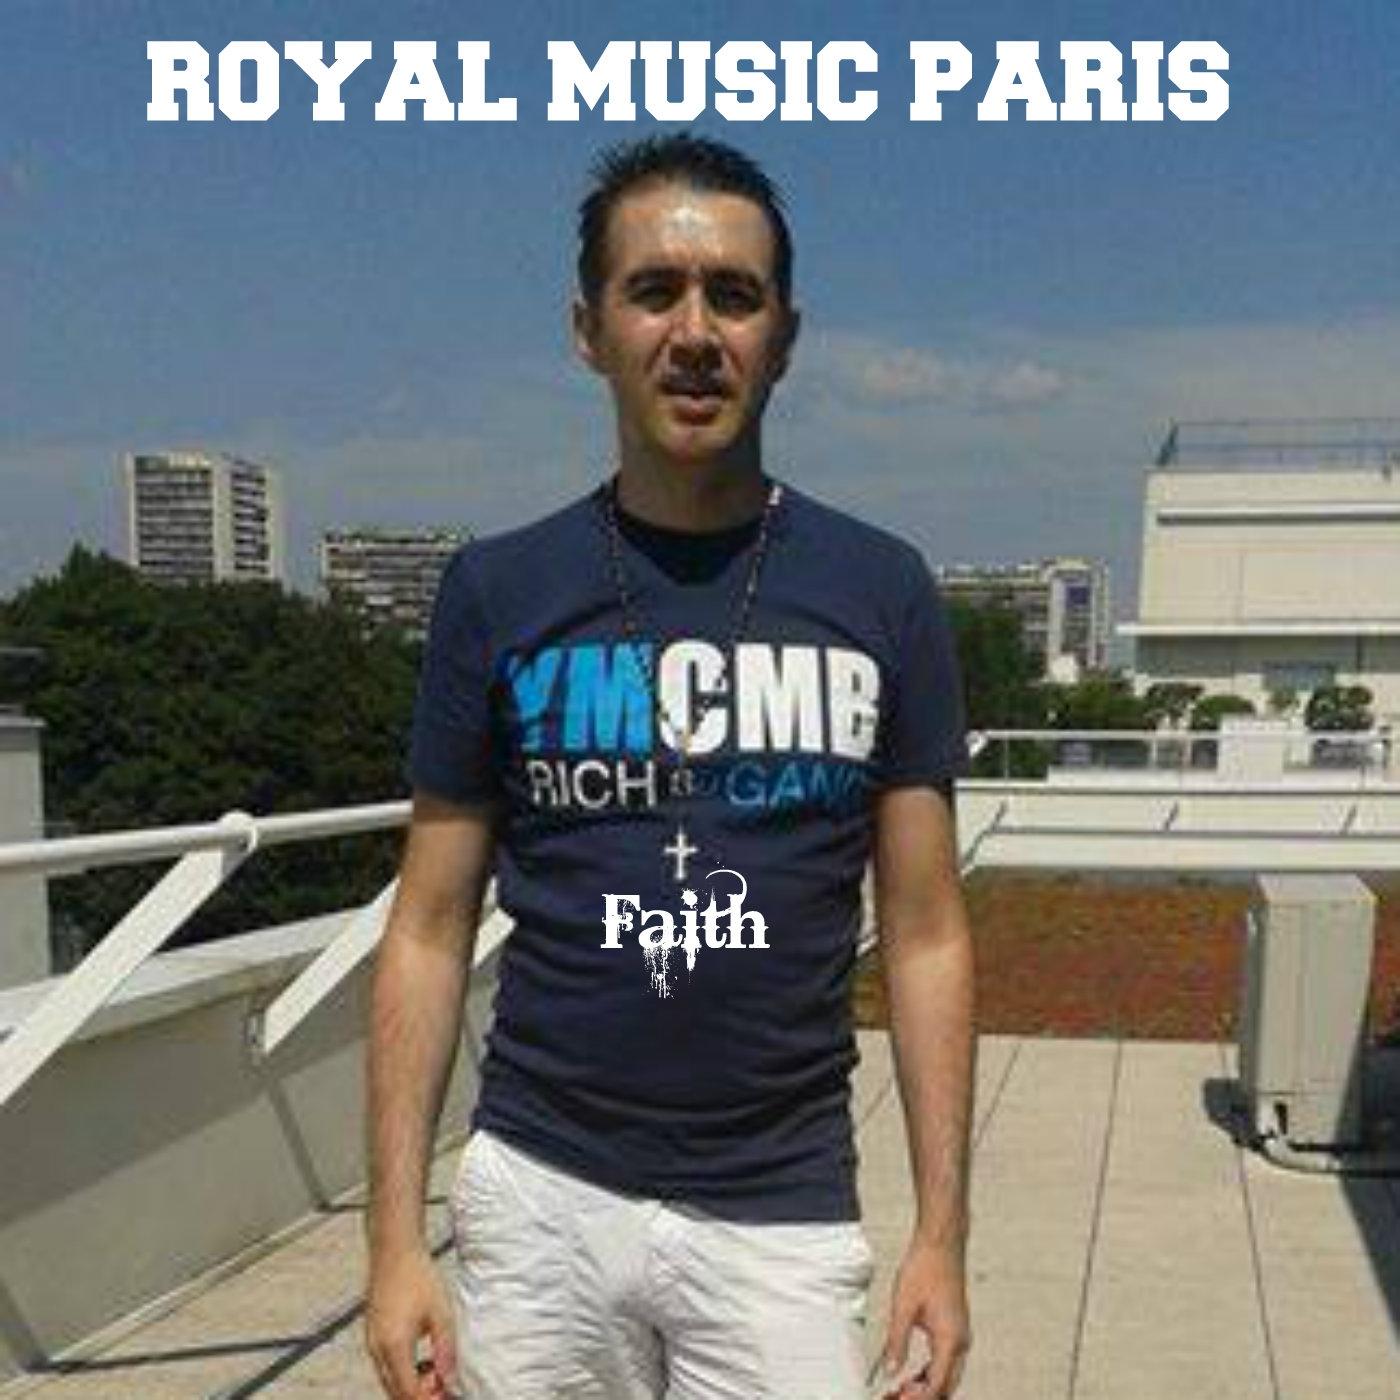 Royal Music Paris - Shadows (Original Mix)